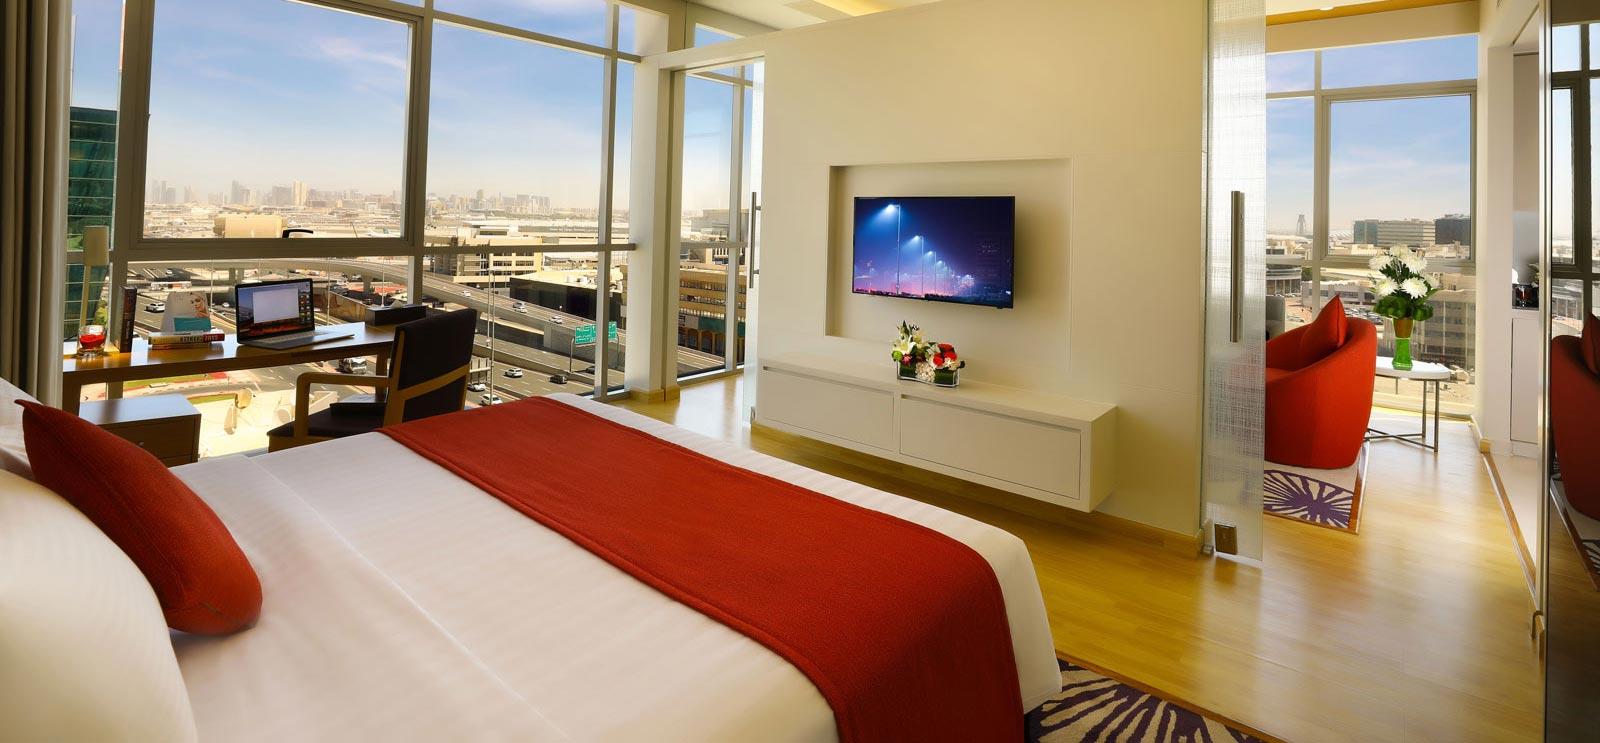 4 star hotel dubai